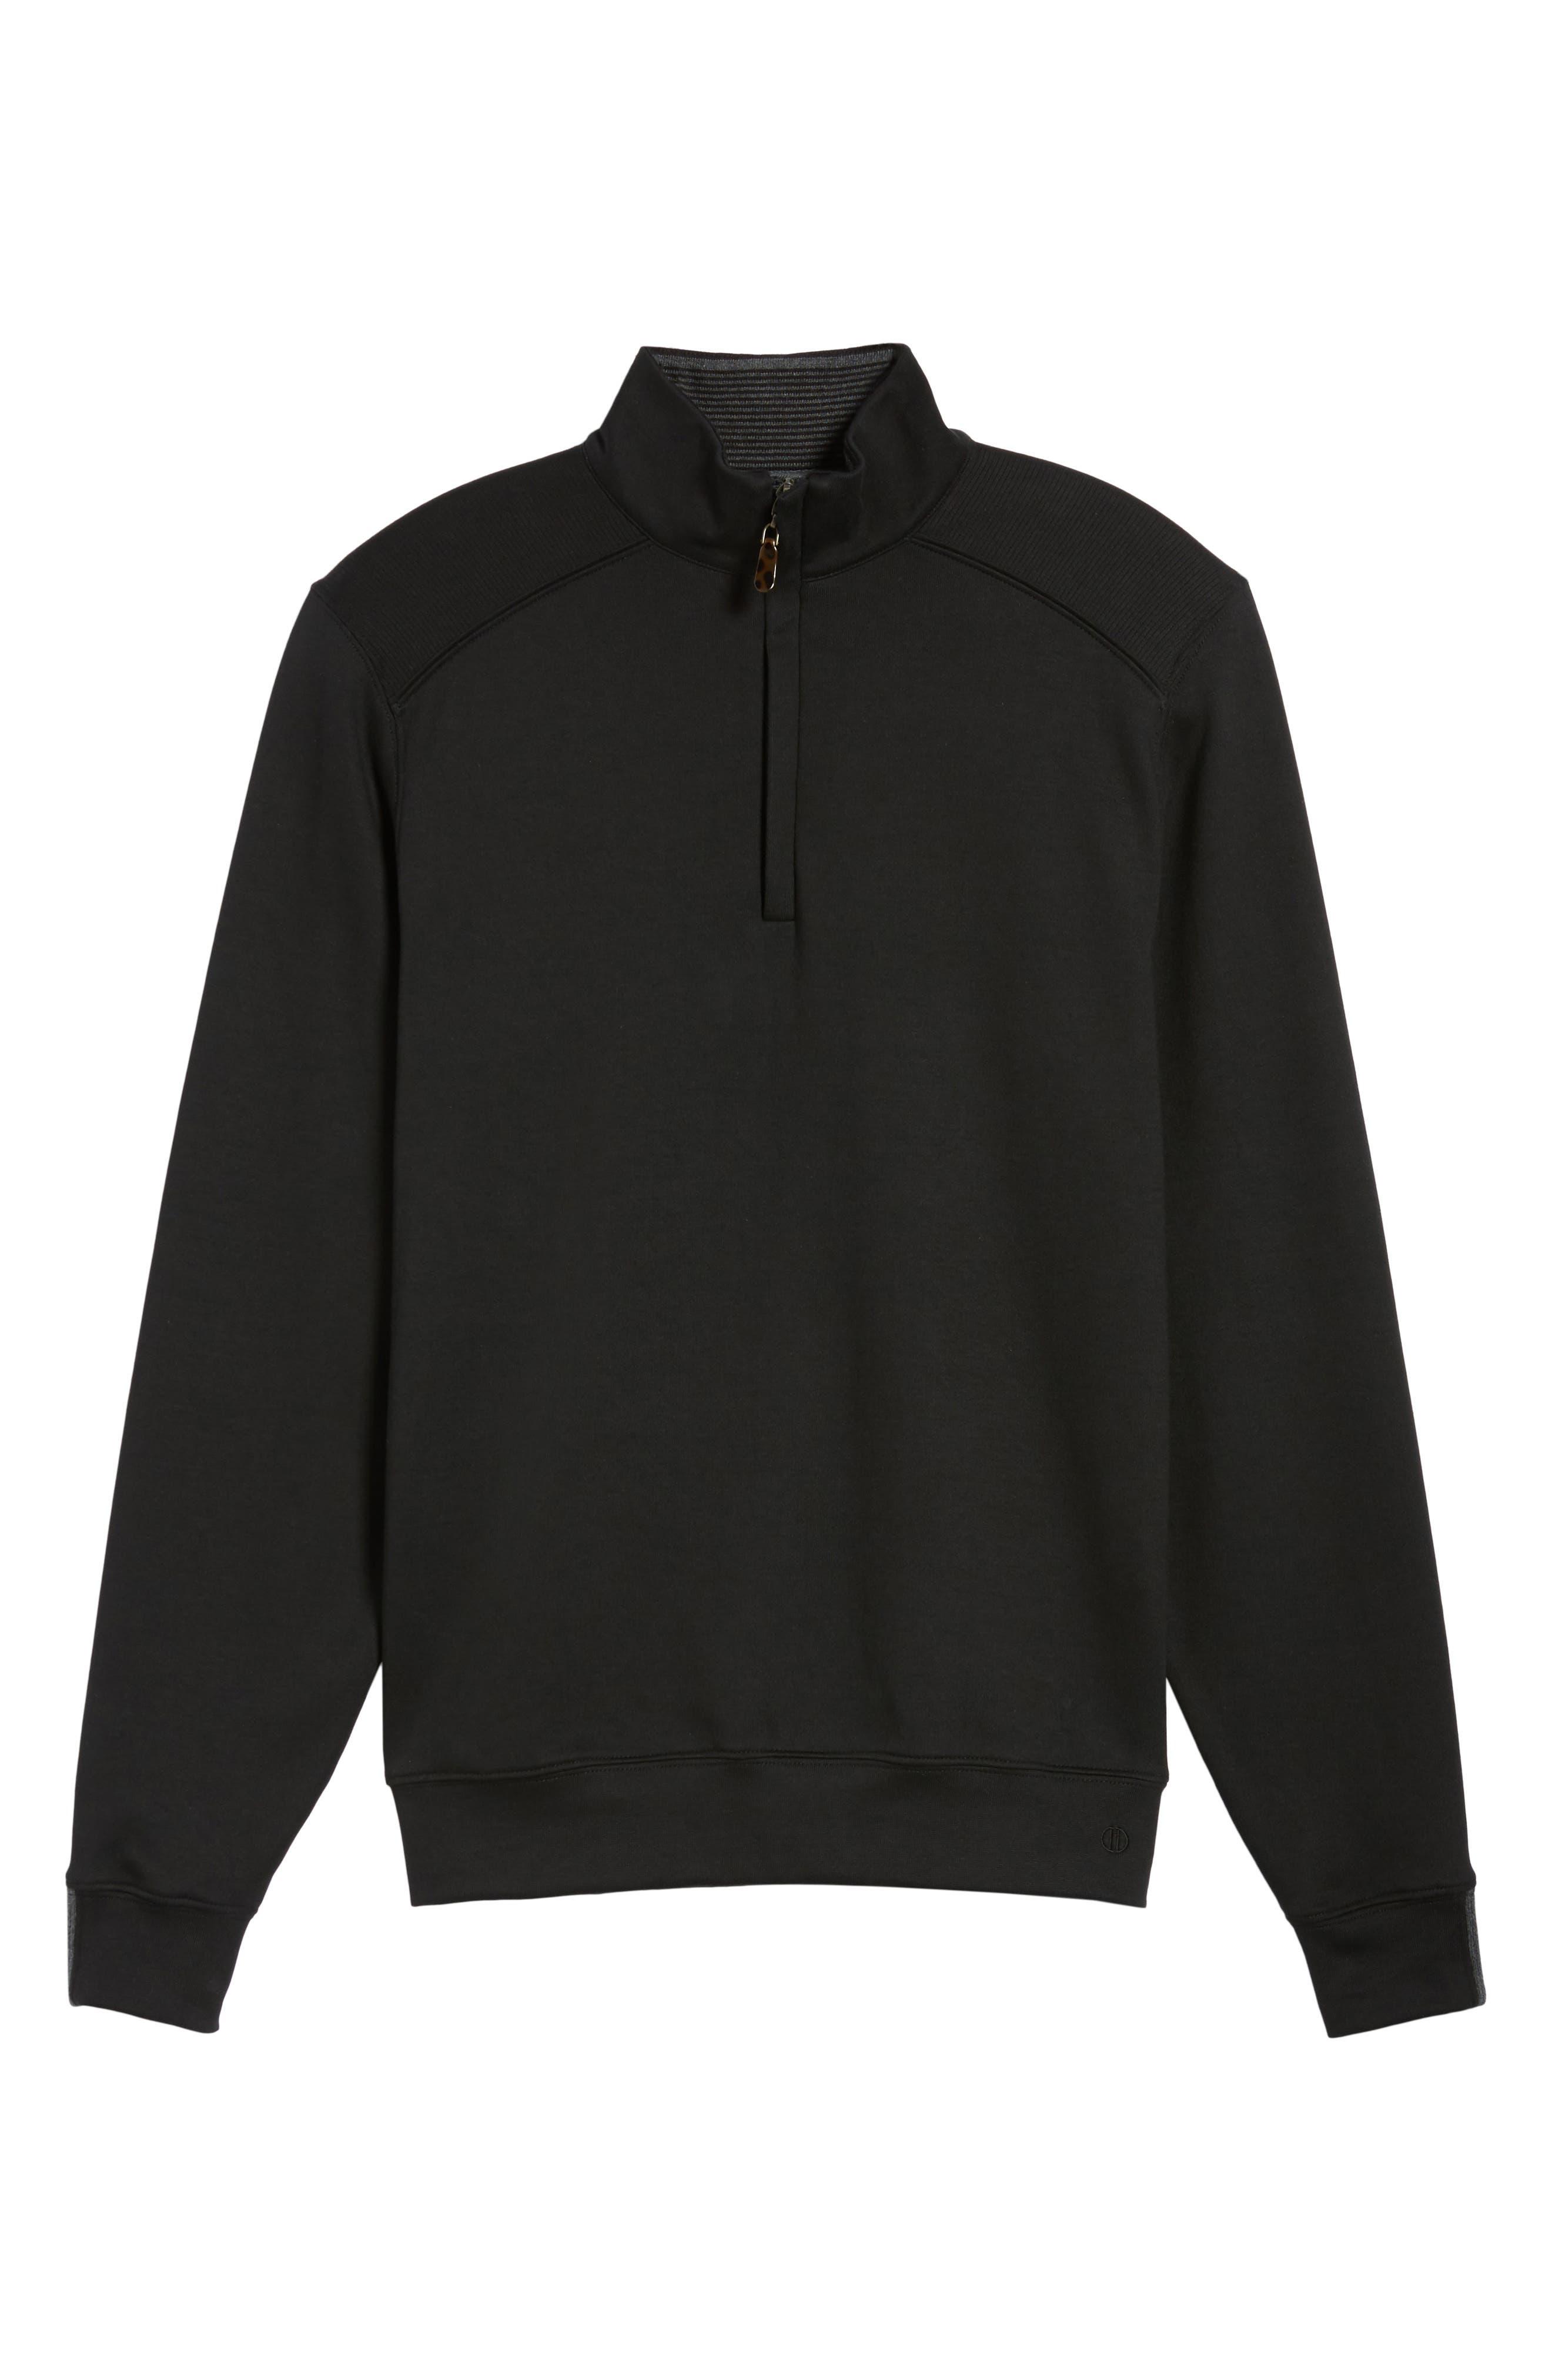 Interlock Knit Quarter Zip Pullover,                             Alternate thumbnail 6, color,                             Black